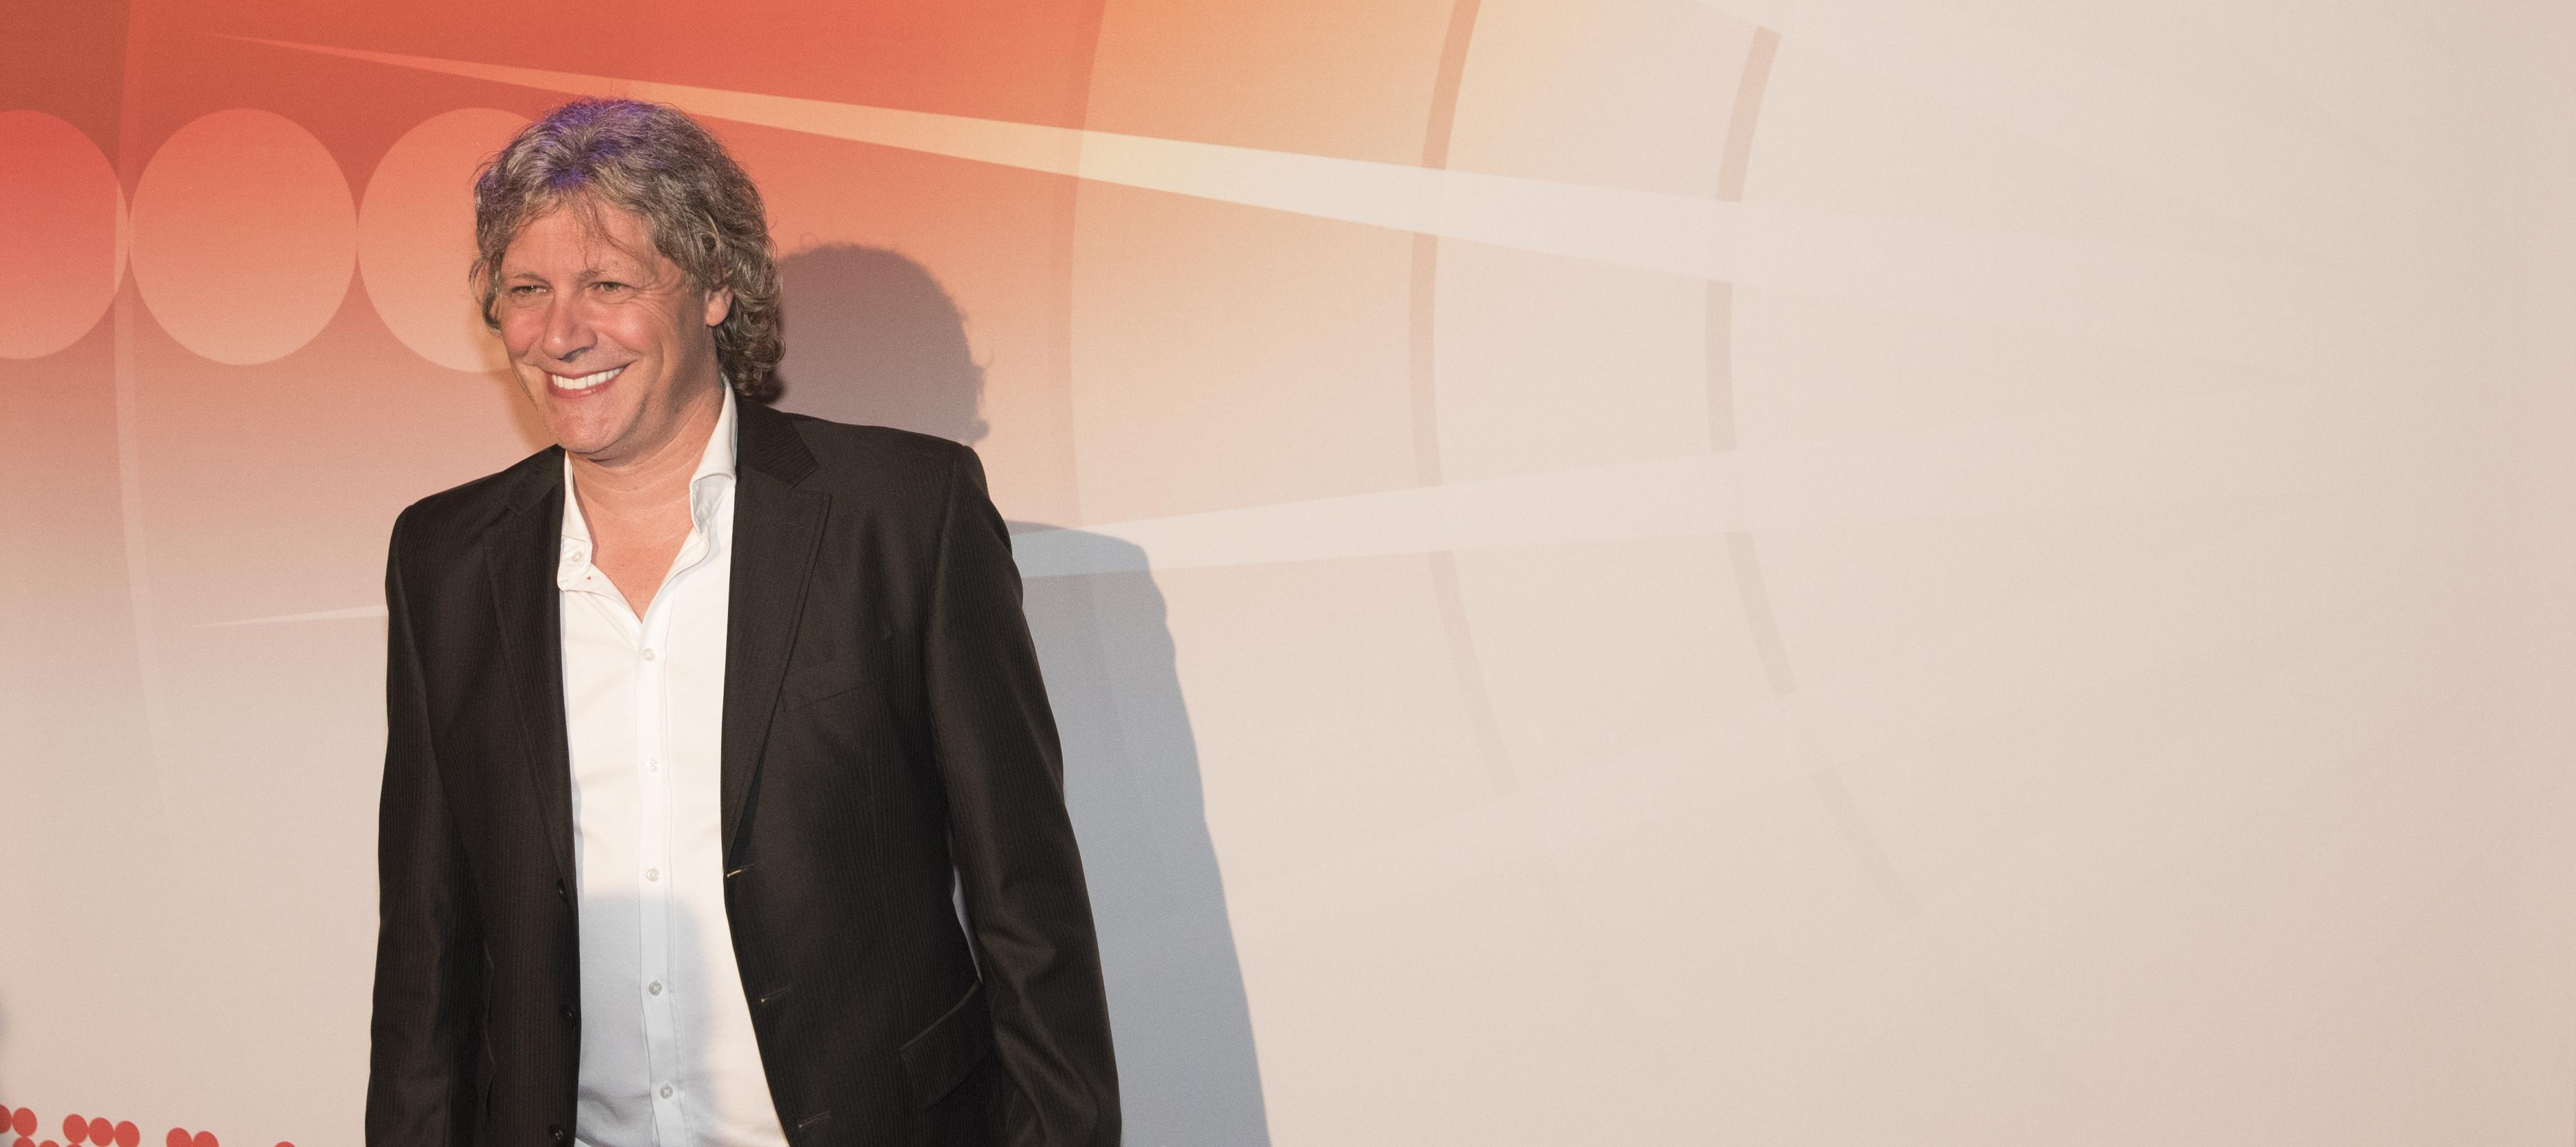 Edwin van Hoevelaak tijdens Buma NL Awards 2017 - Fotocredits: Shali Blok (ArtiestenNieuws)